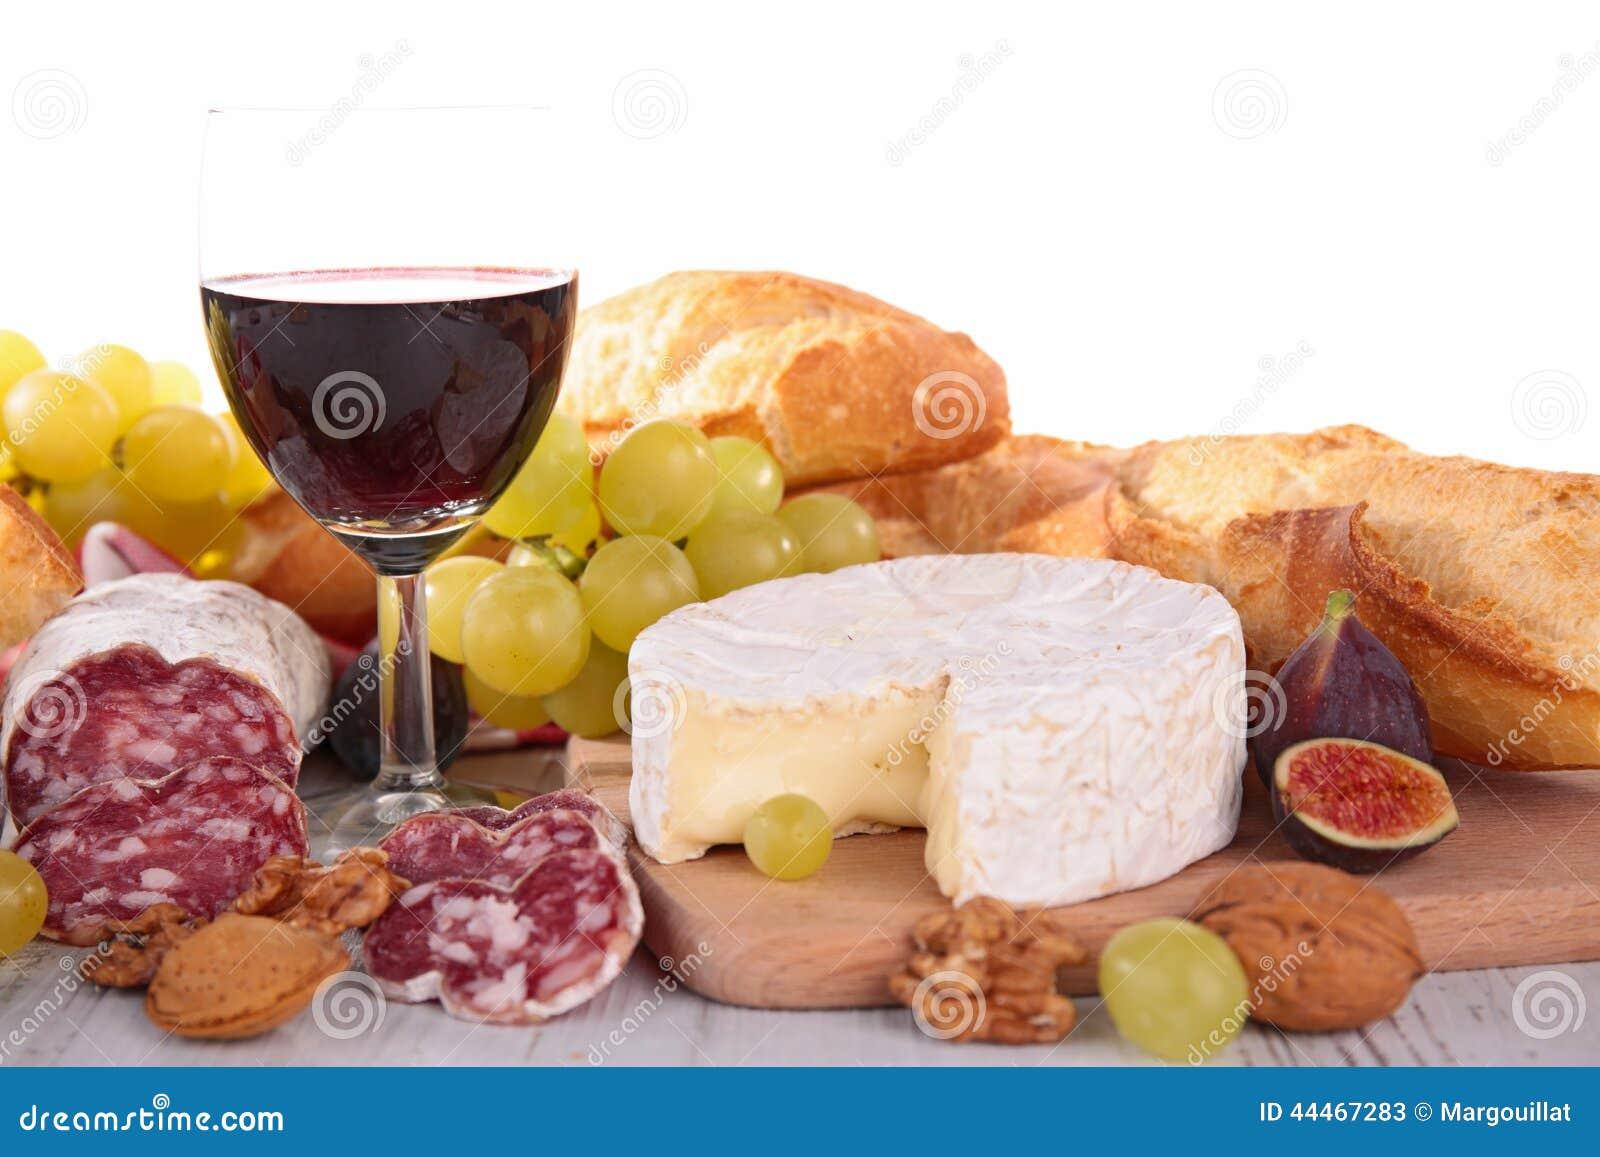 vin fromage saucisse et pain image stock image du figue nourriture 44467283. Black Bedroom Furniture Sets. Home Design Ideas